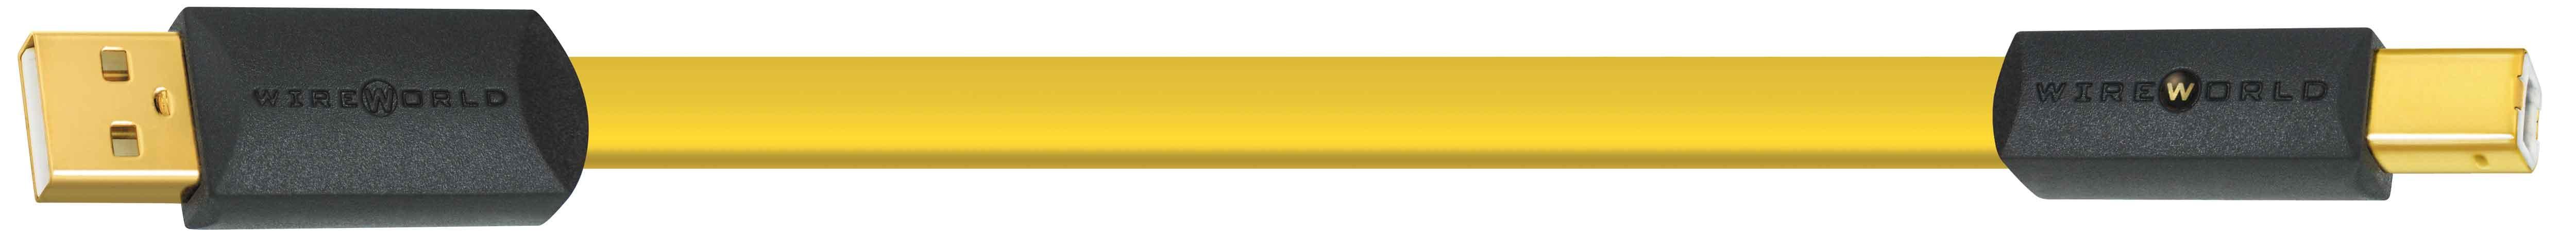 WireWorld Chroma 8, USB 2.0 (A to B) kaapeli